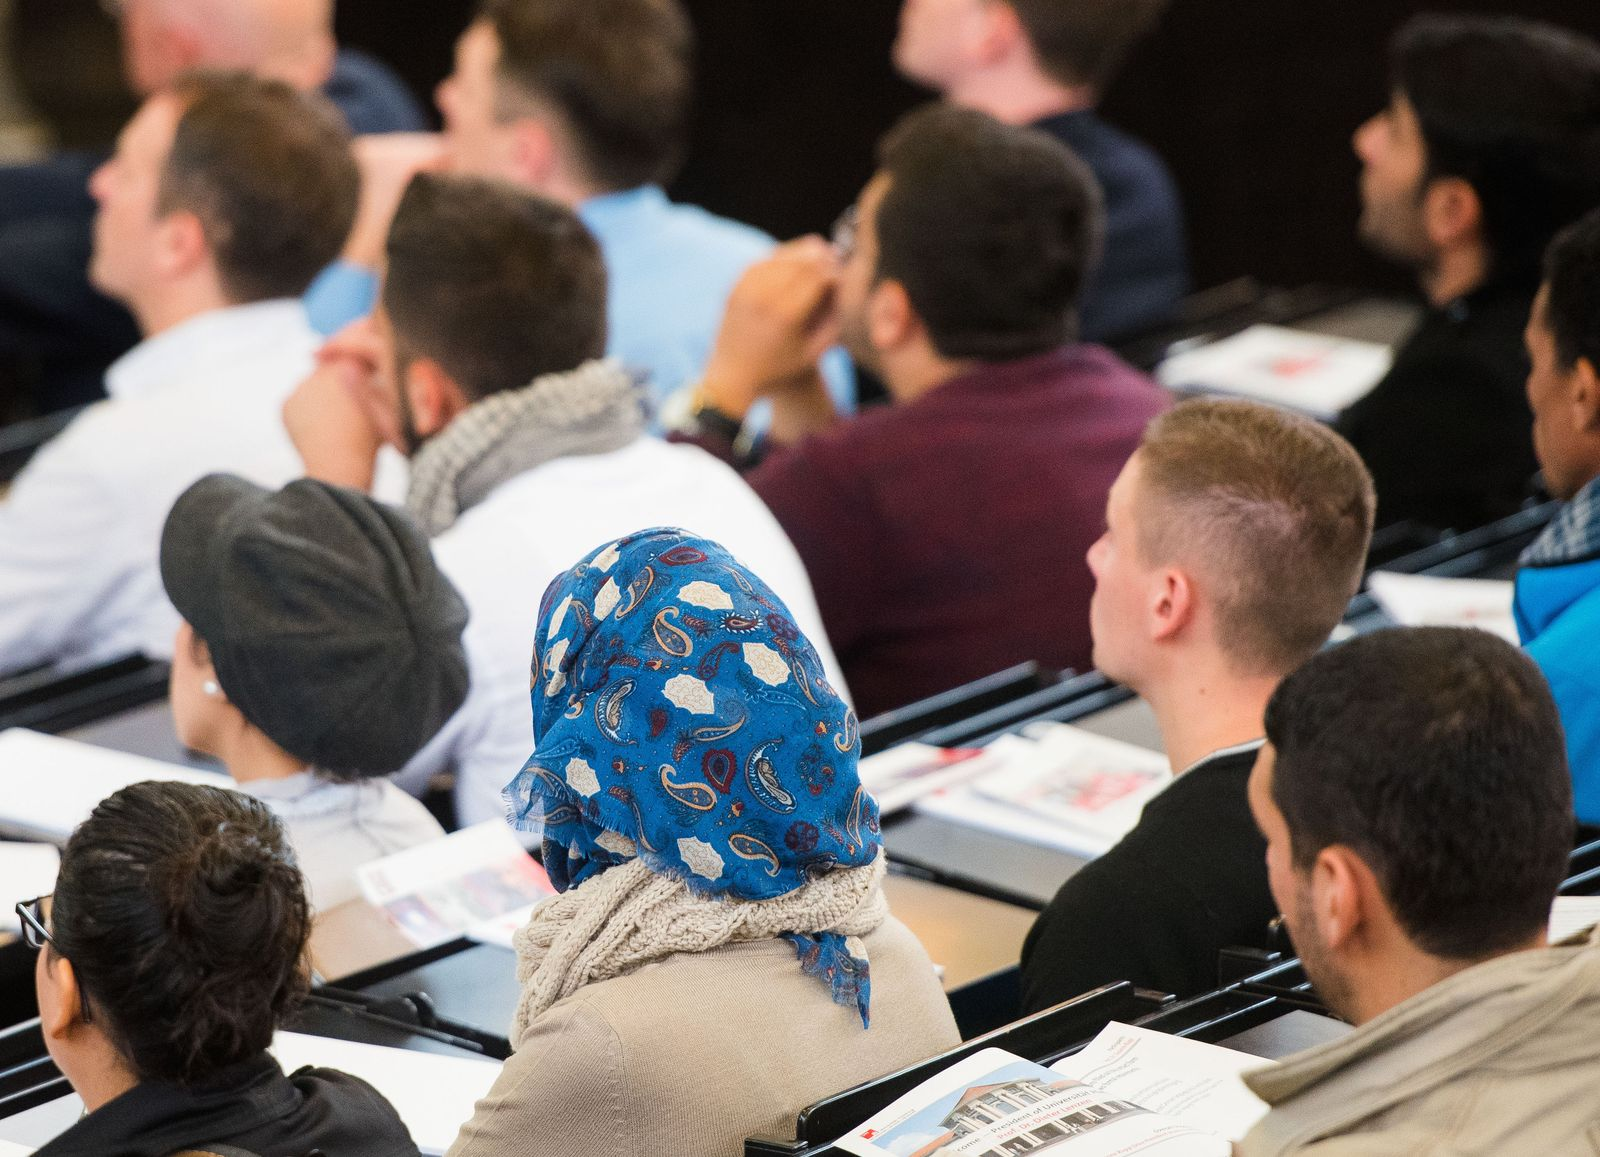 Flüchtlinge als Gasthörer an Universitäten